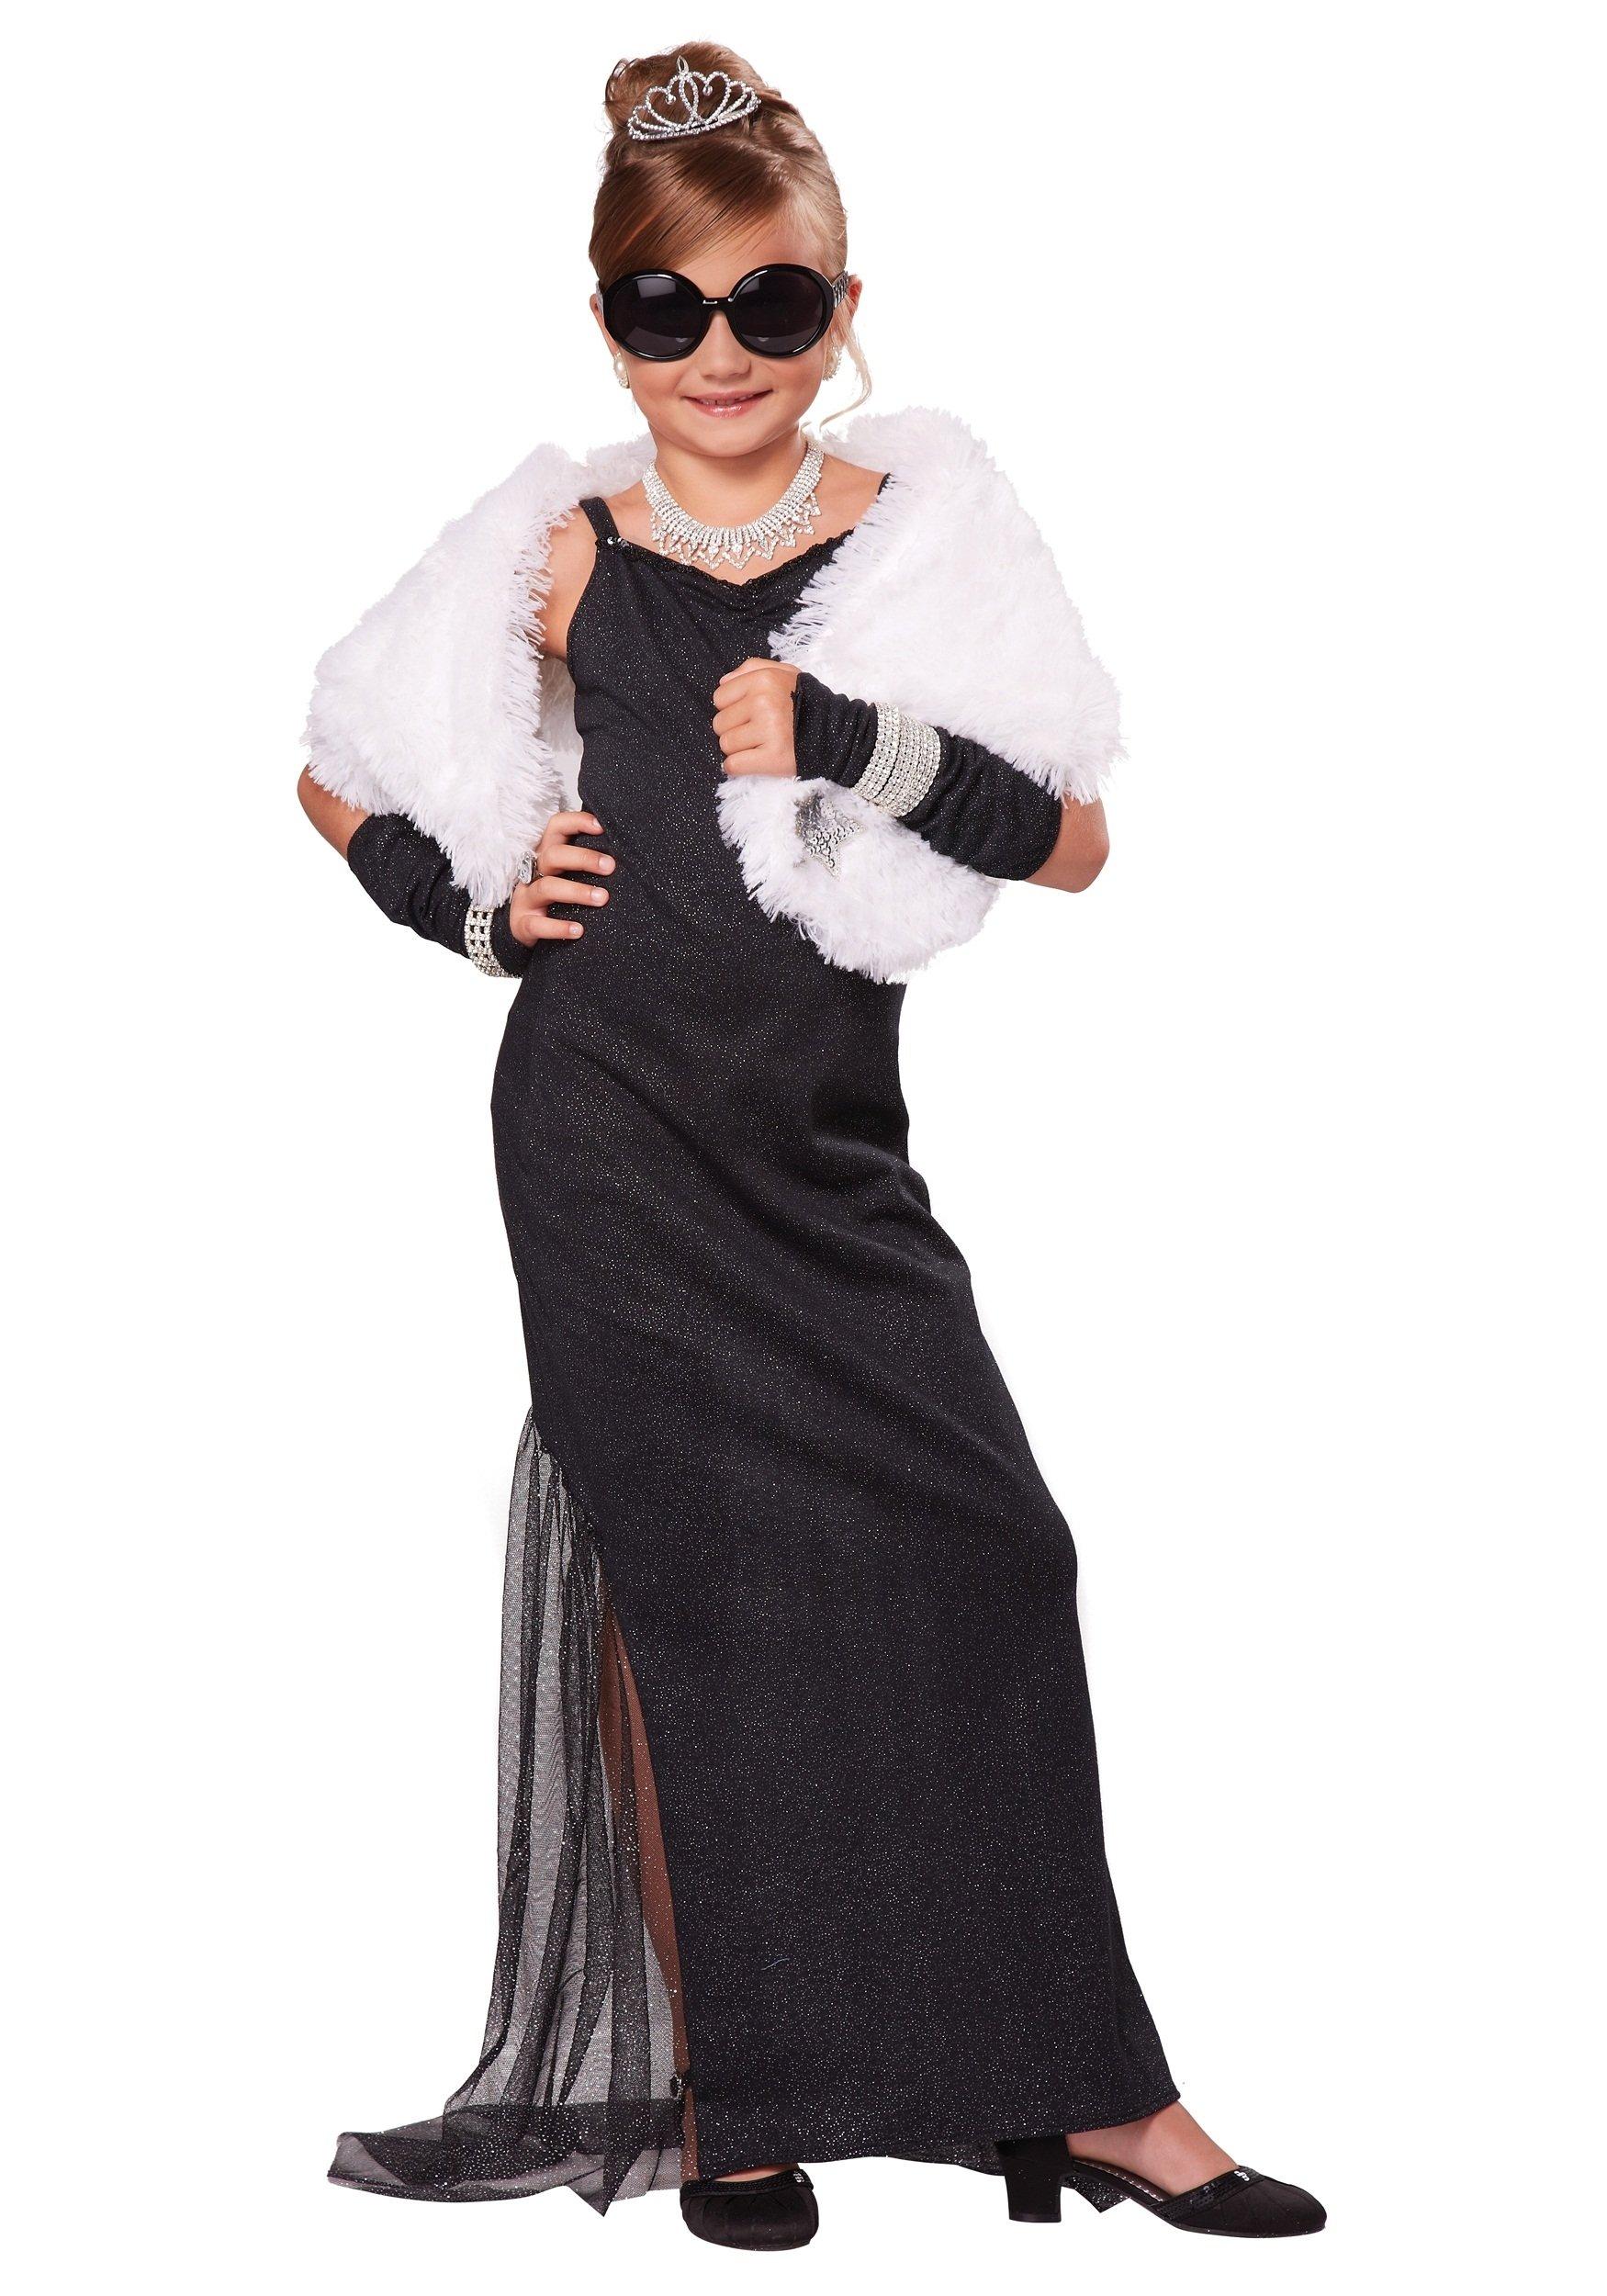 10 Stylish Movie Costume Ideas For Women girls hollywood diva costume 2021